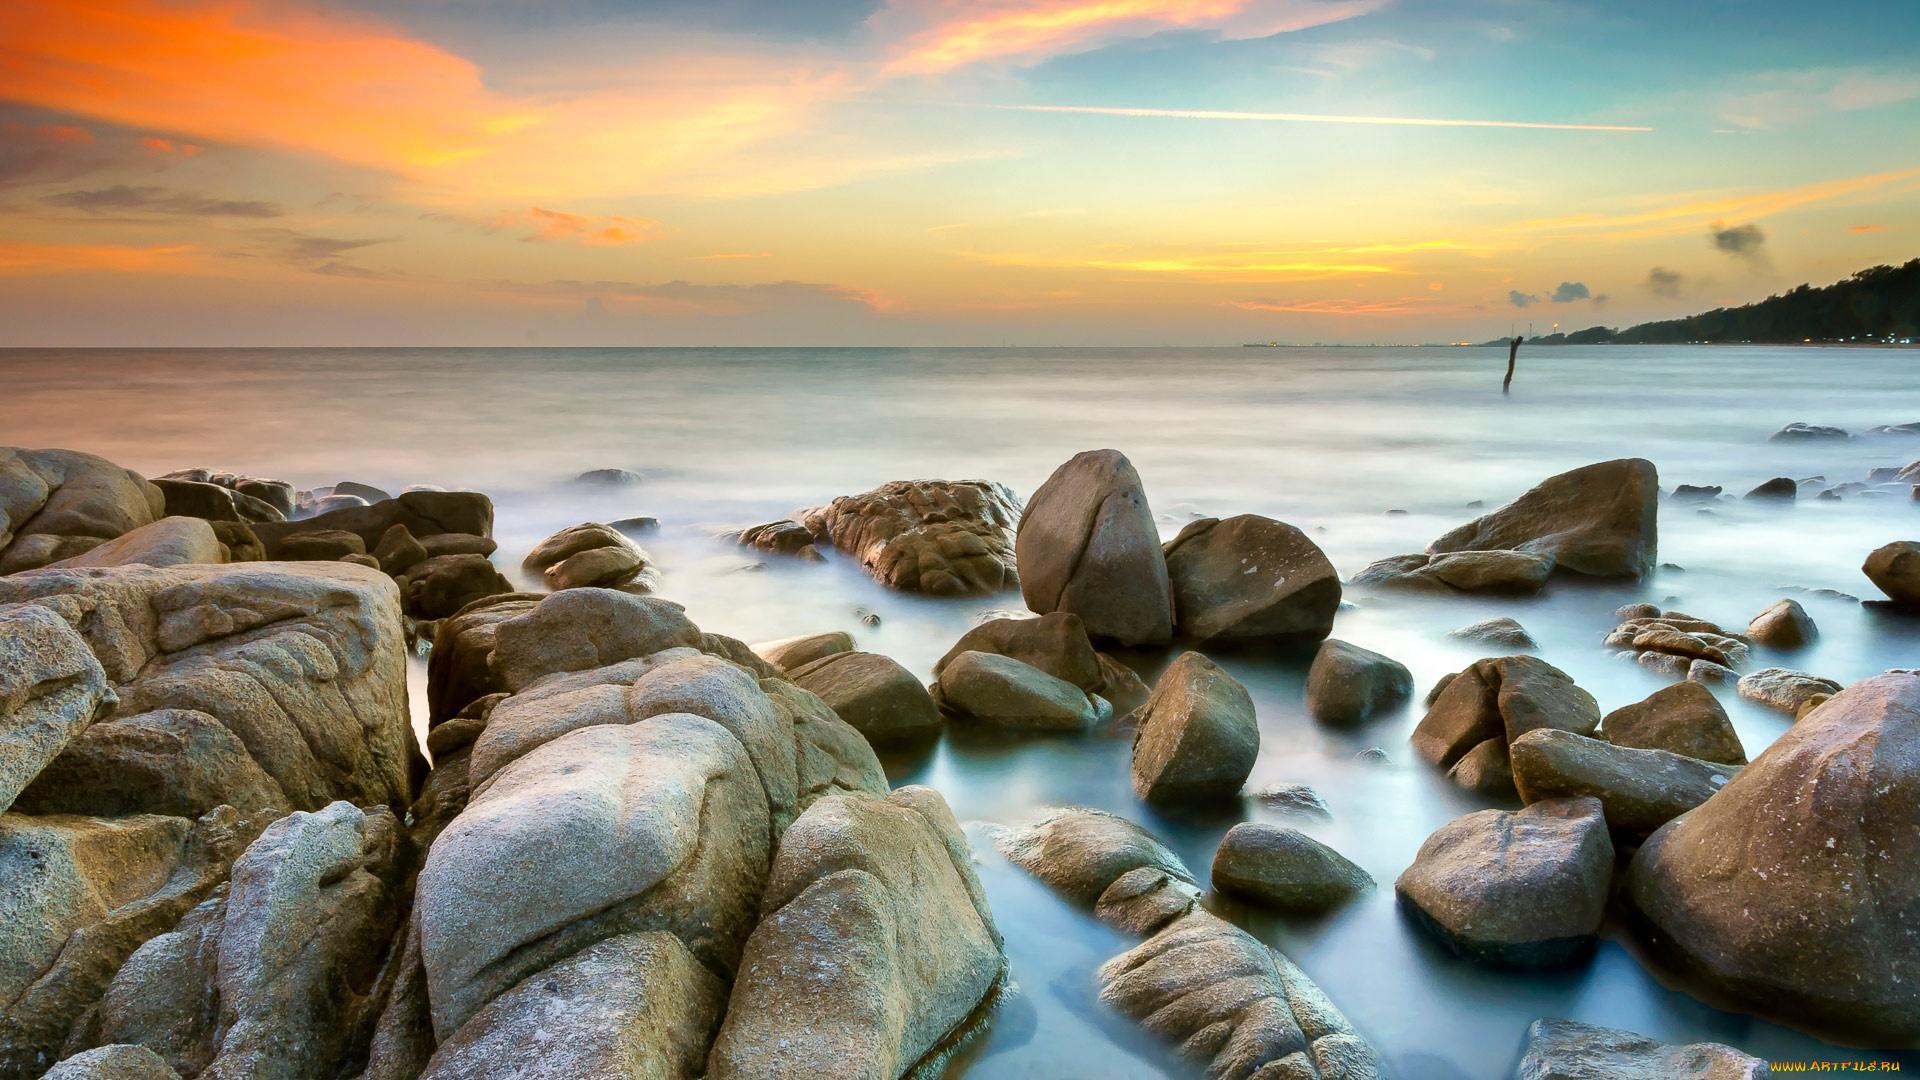 горизонт камни вода  № 2556016 бесплатно